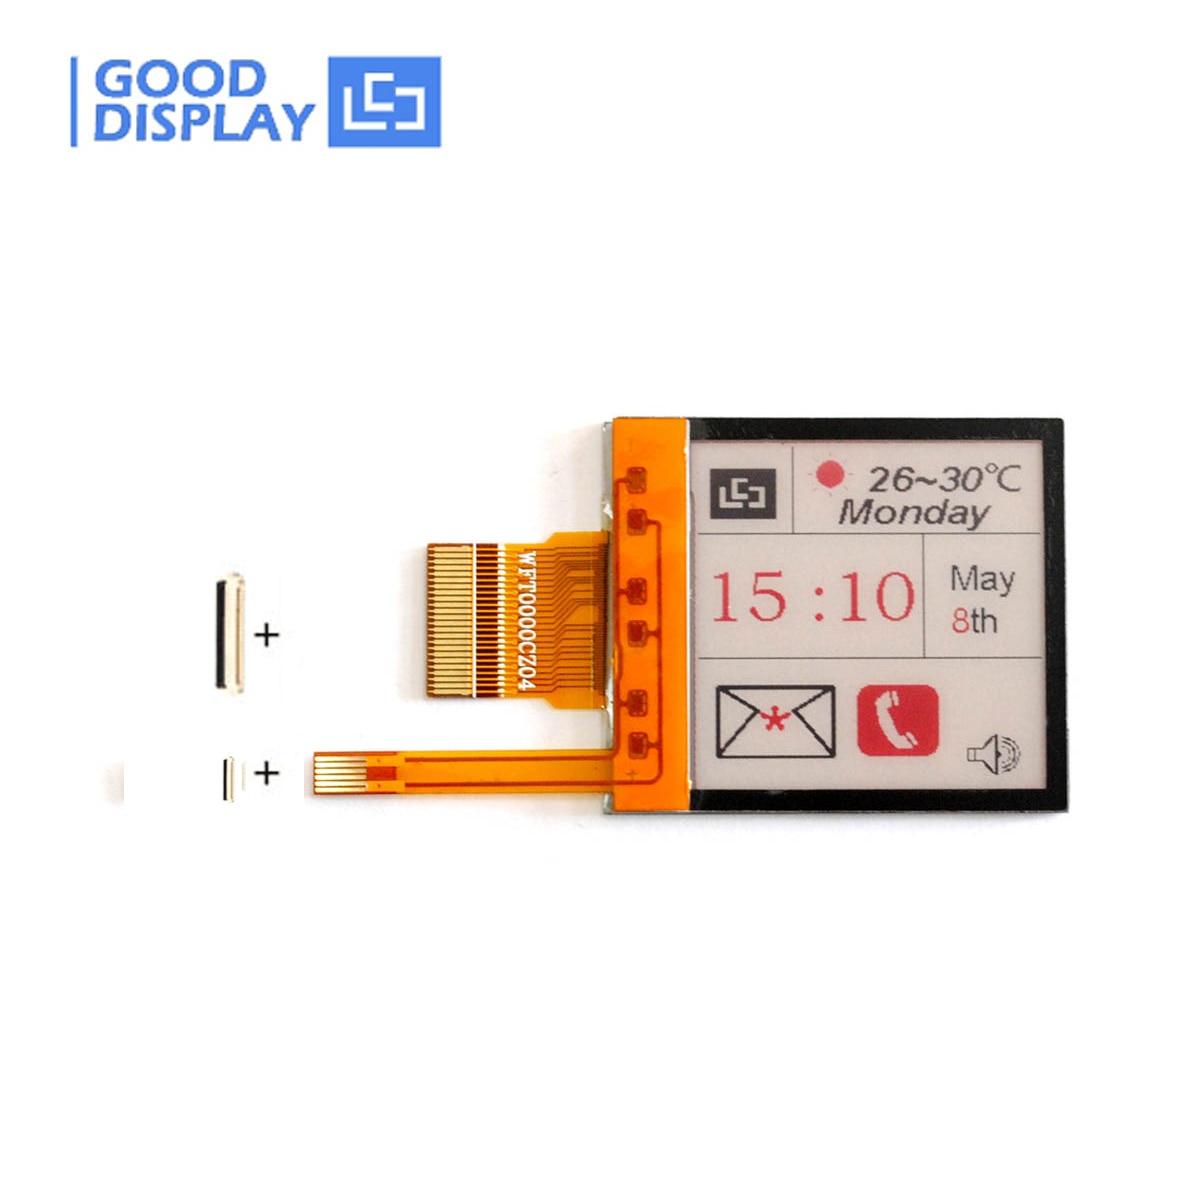 1.54 Inch 3-color Epaper Screen With Frontlight Display Eink Display